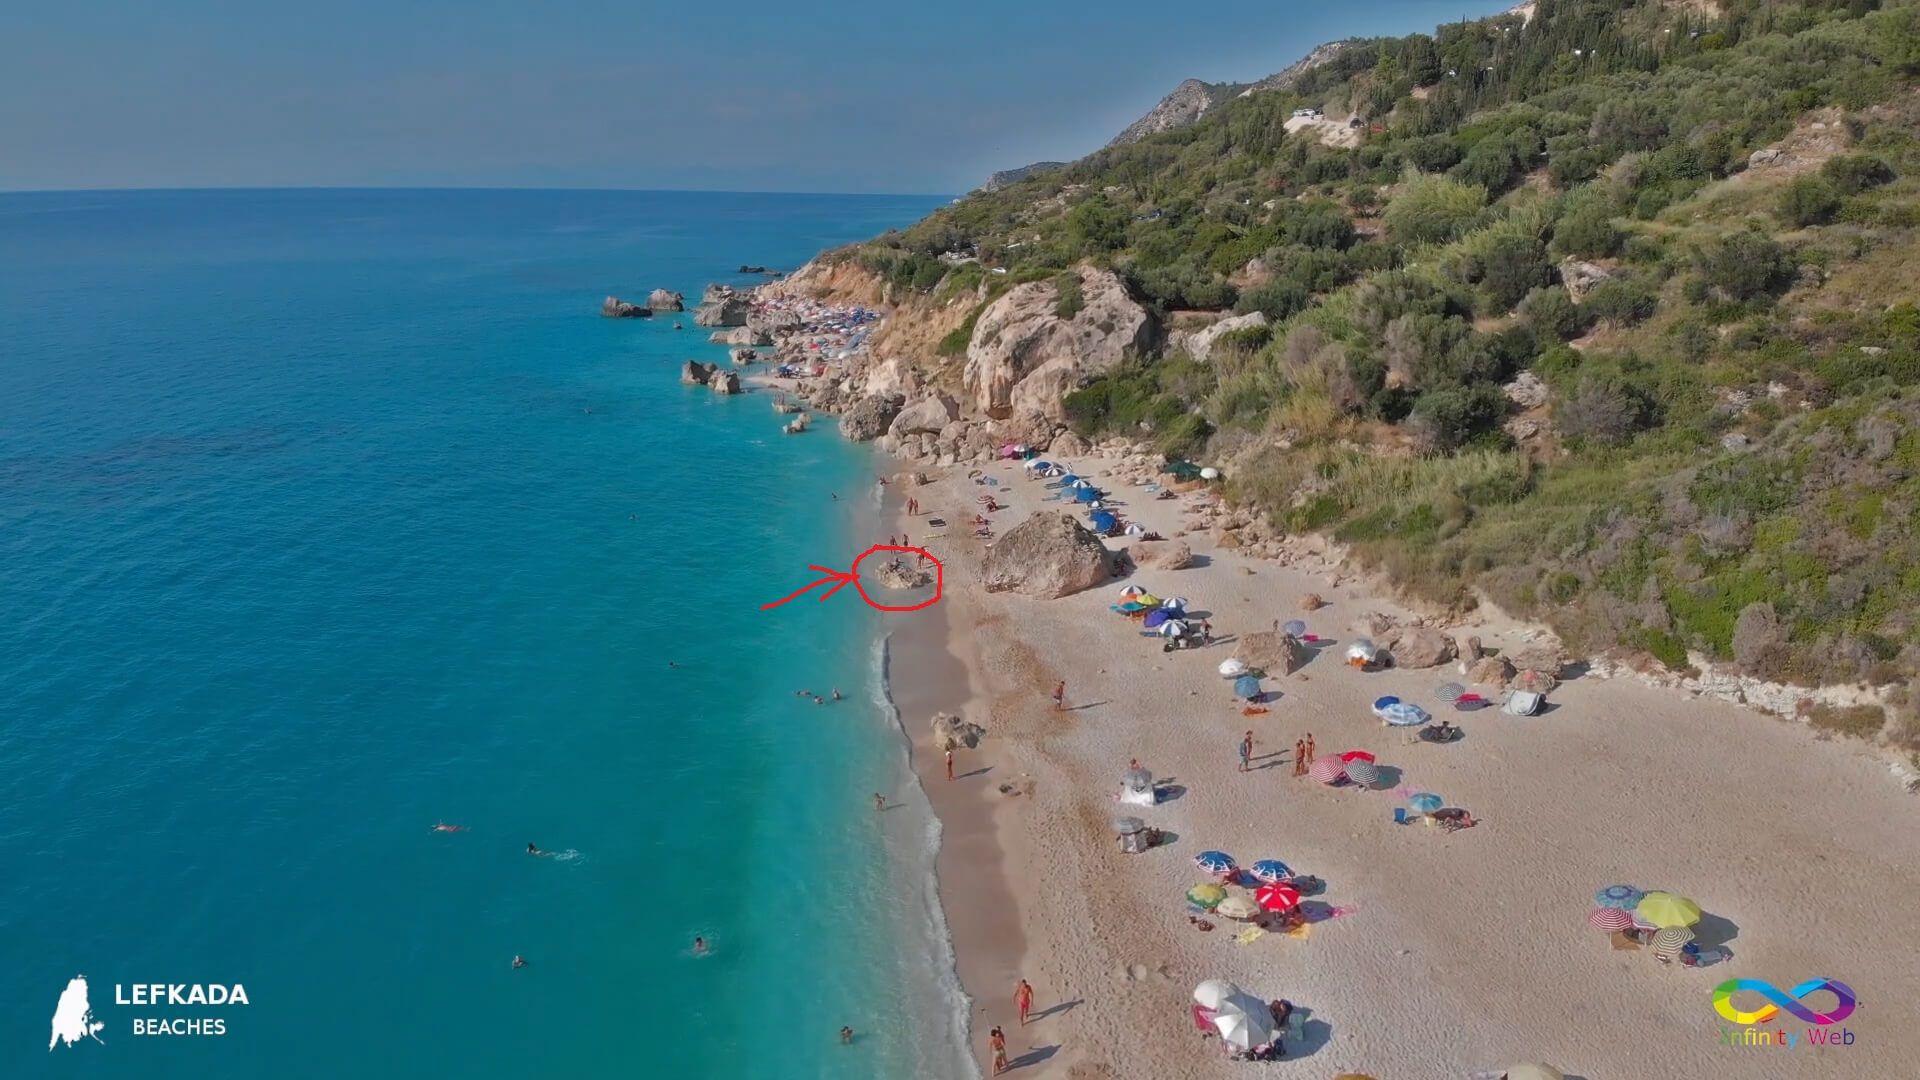 lefkada-beaches-infinityweb-megali-petra